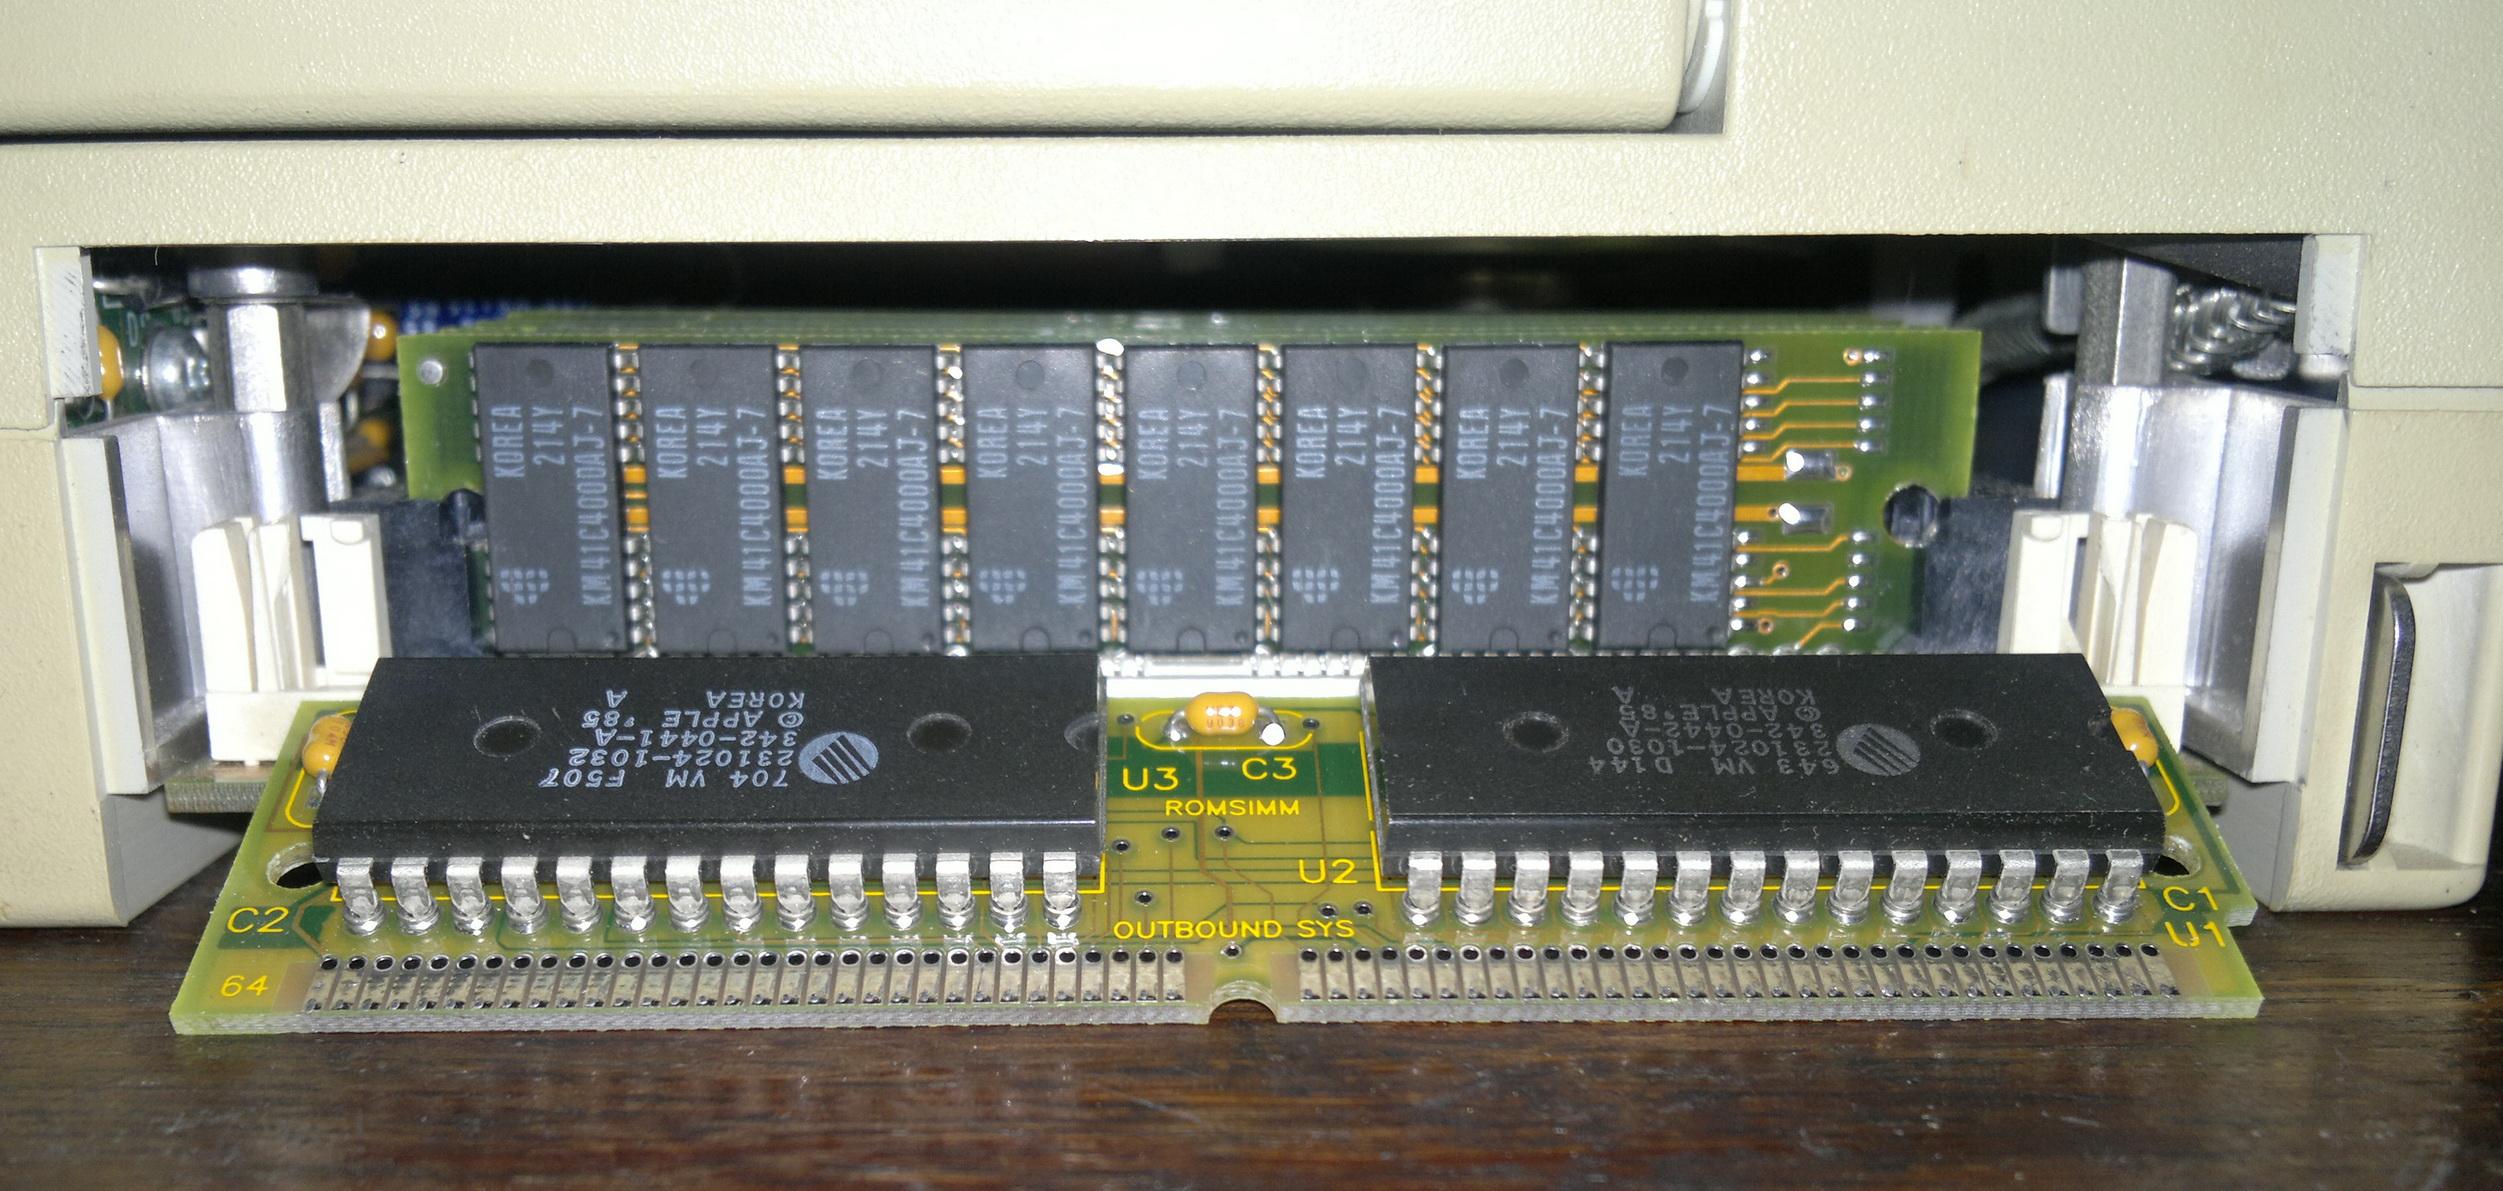 Ram slot image